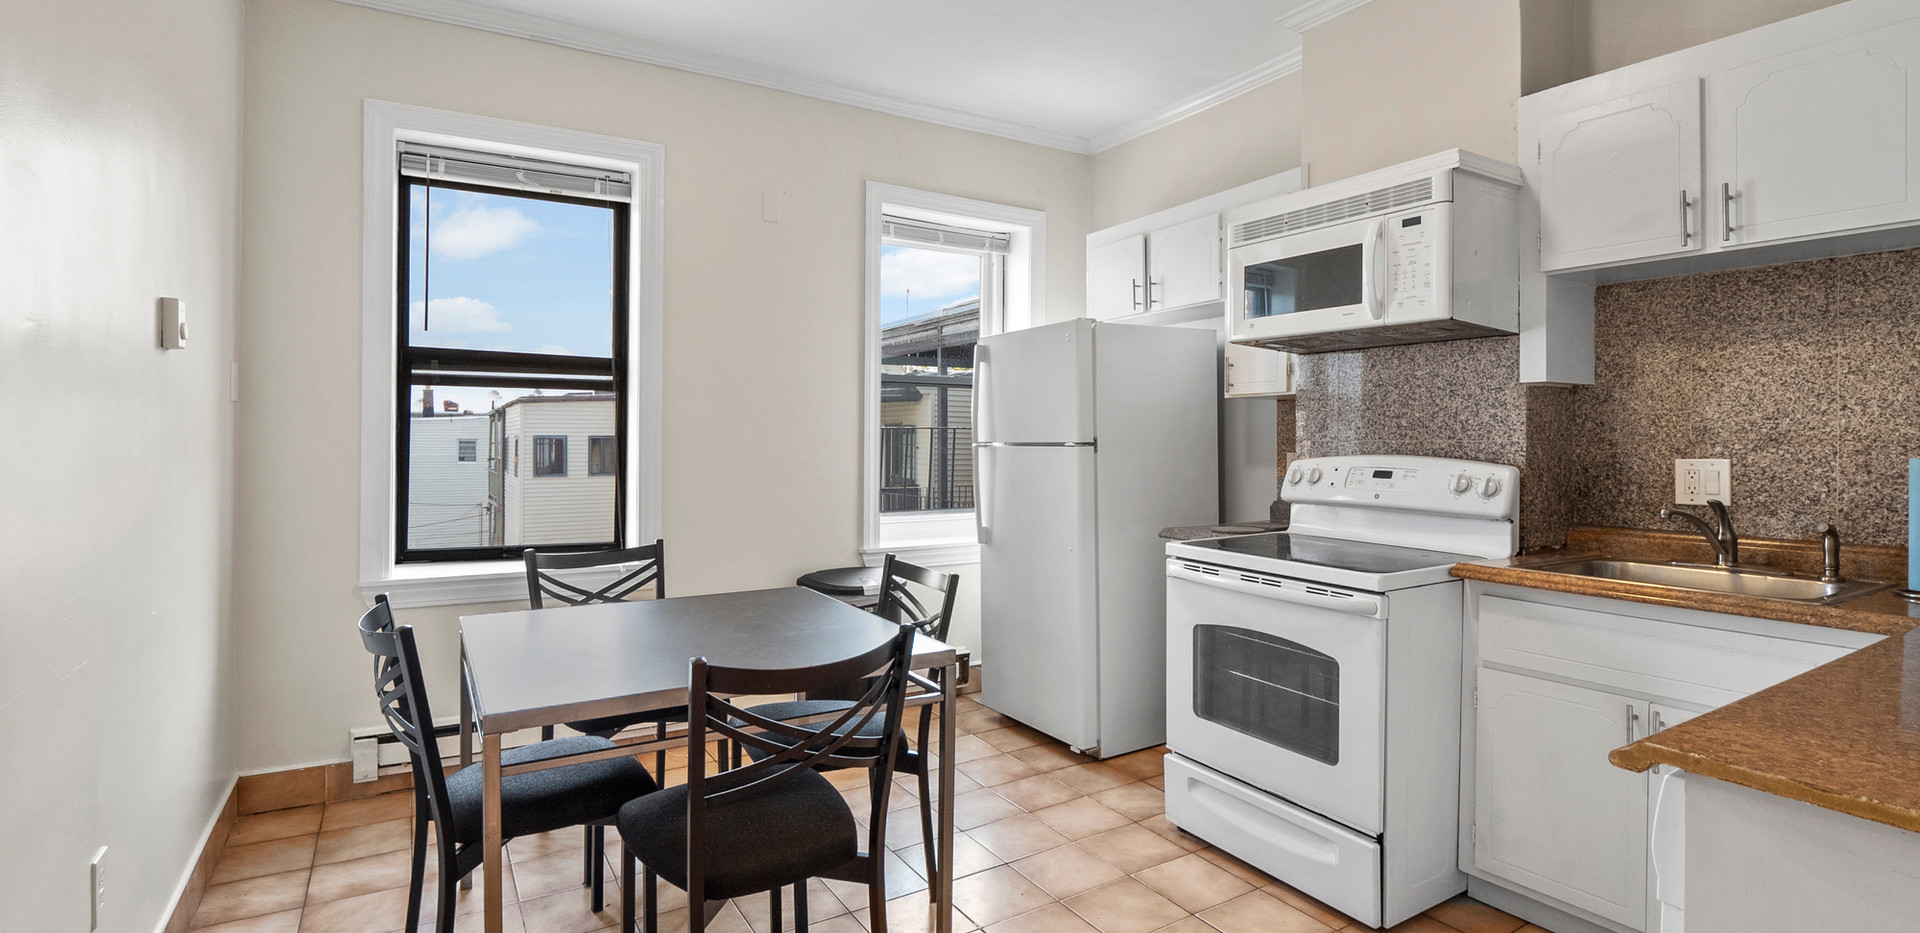 Kitchen at 32 Shelby Street Unit 3